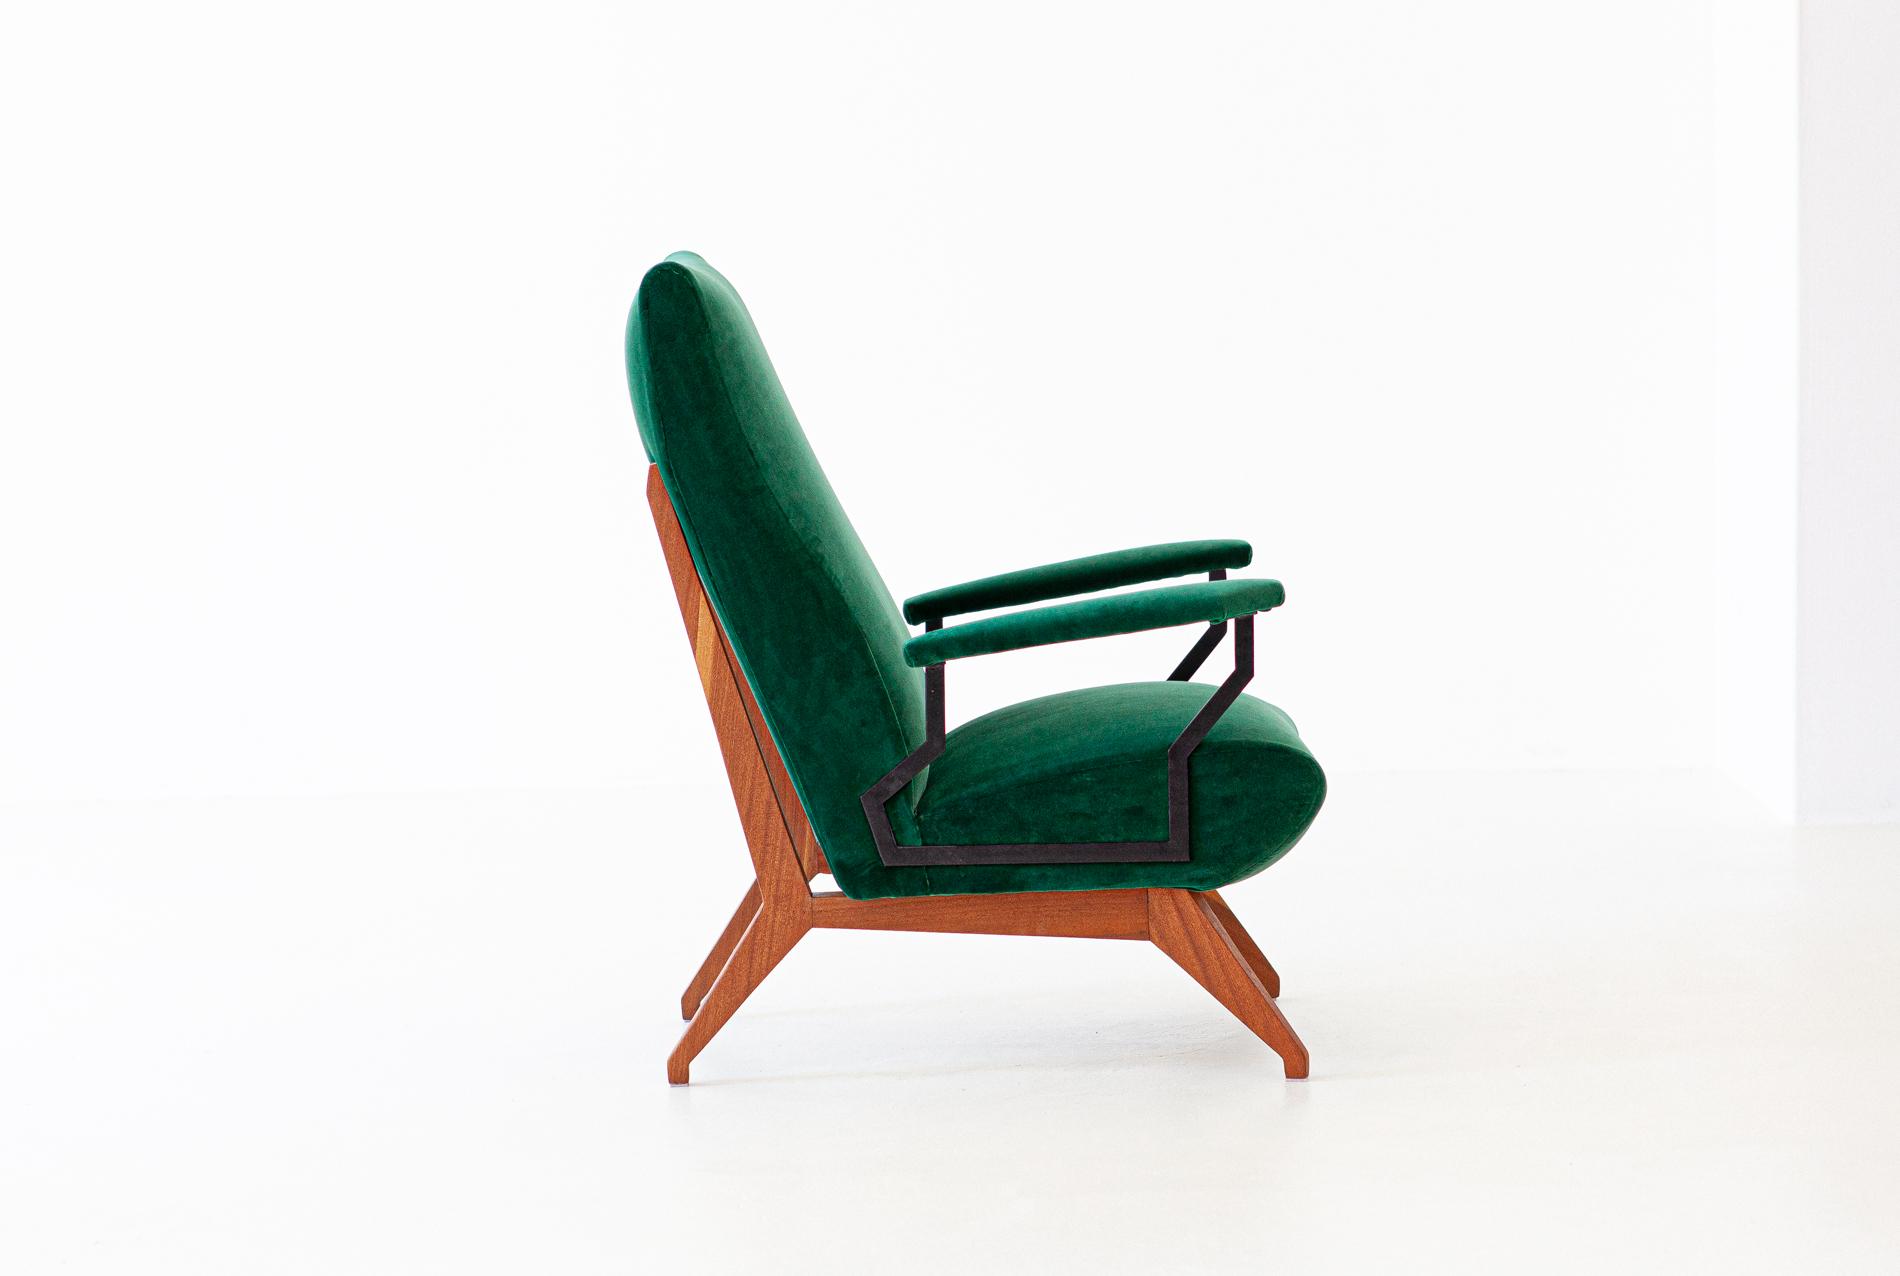 1950s-green-velvet-mahogany-italian-armchair-3-se290